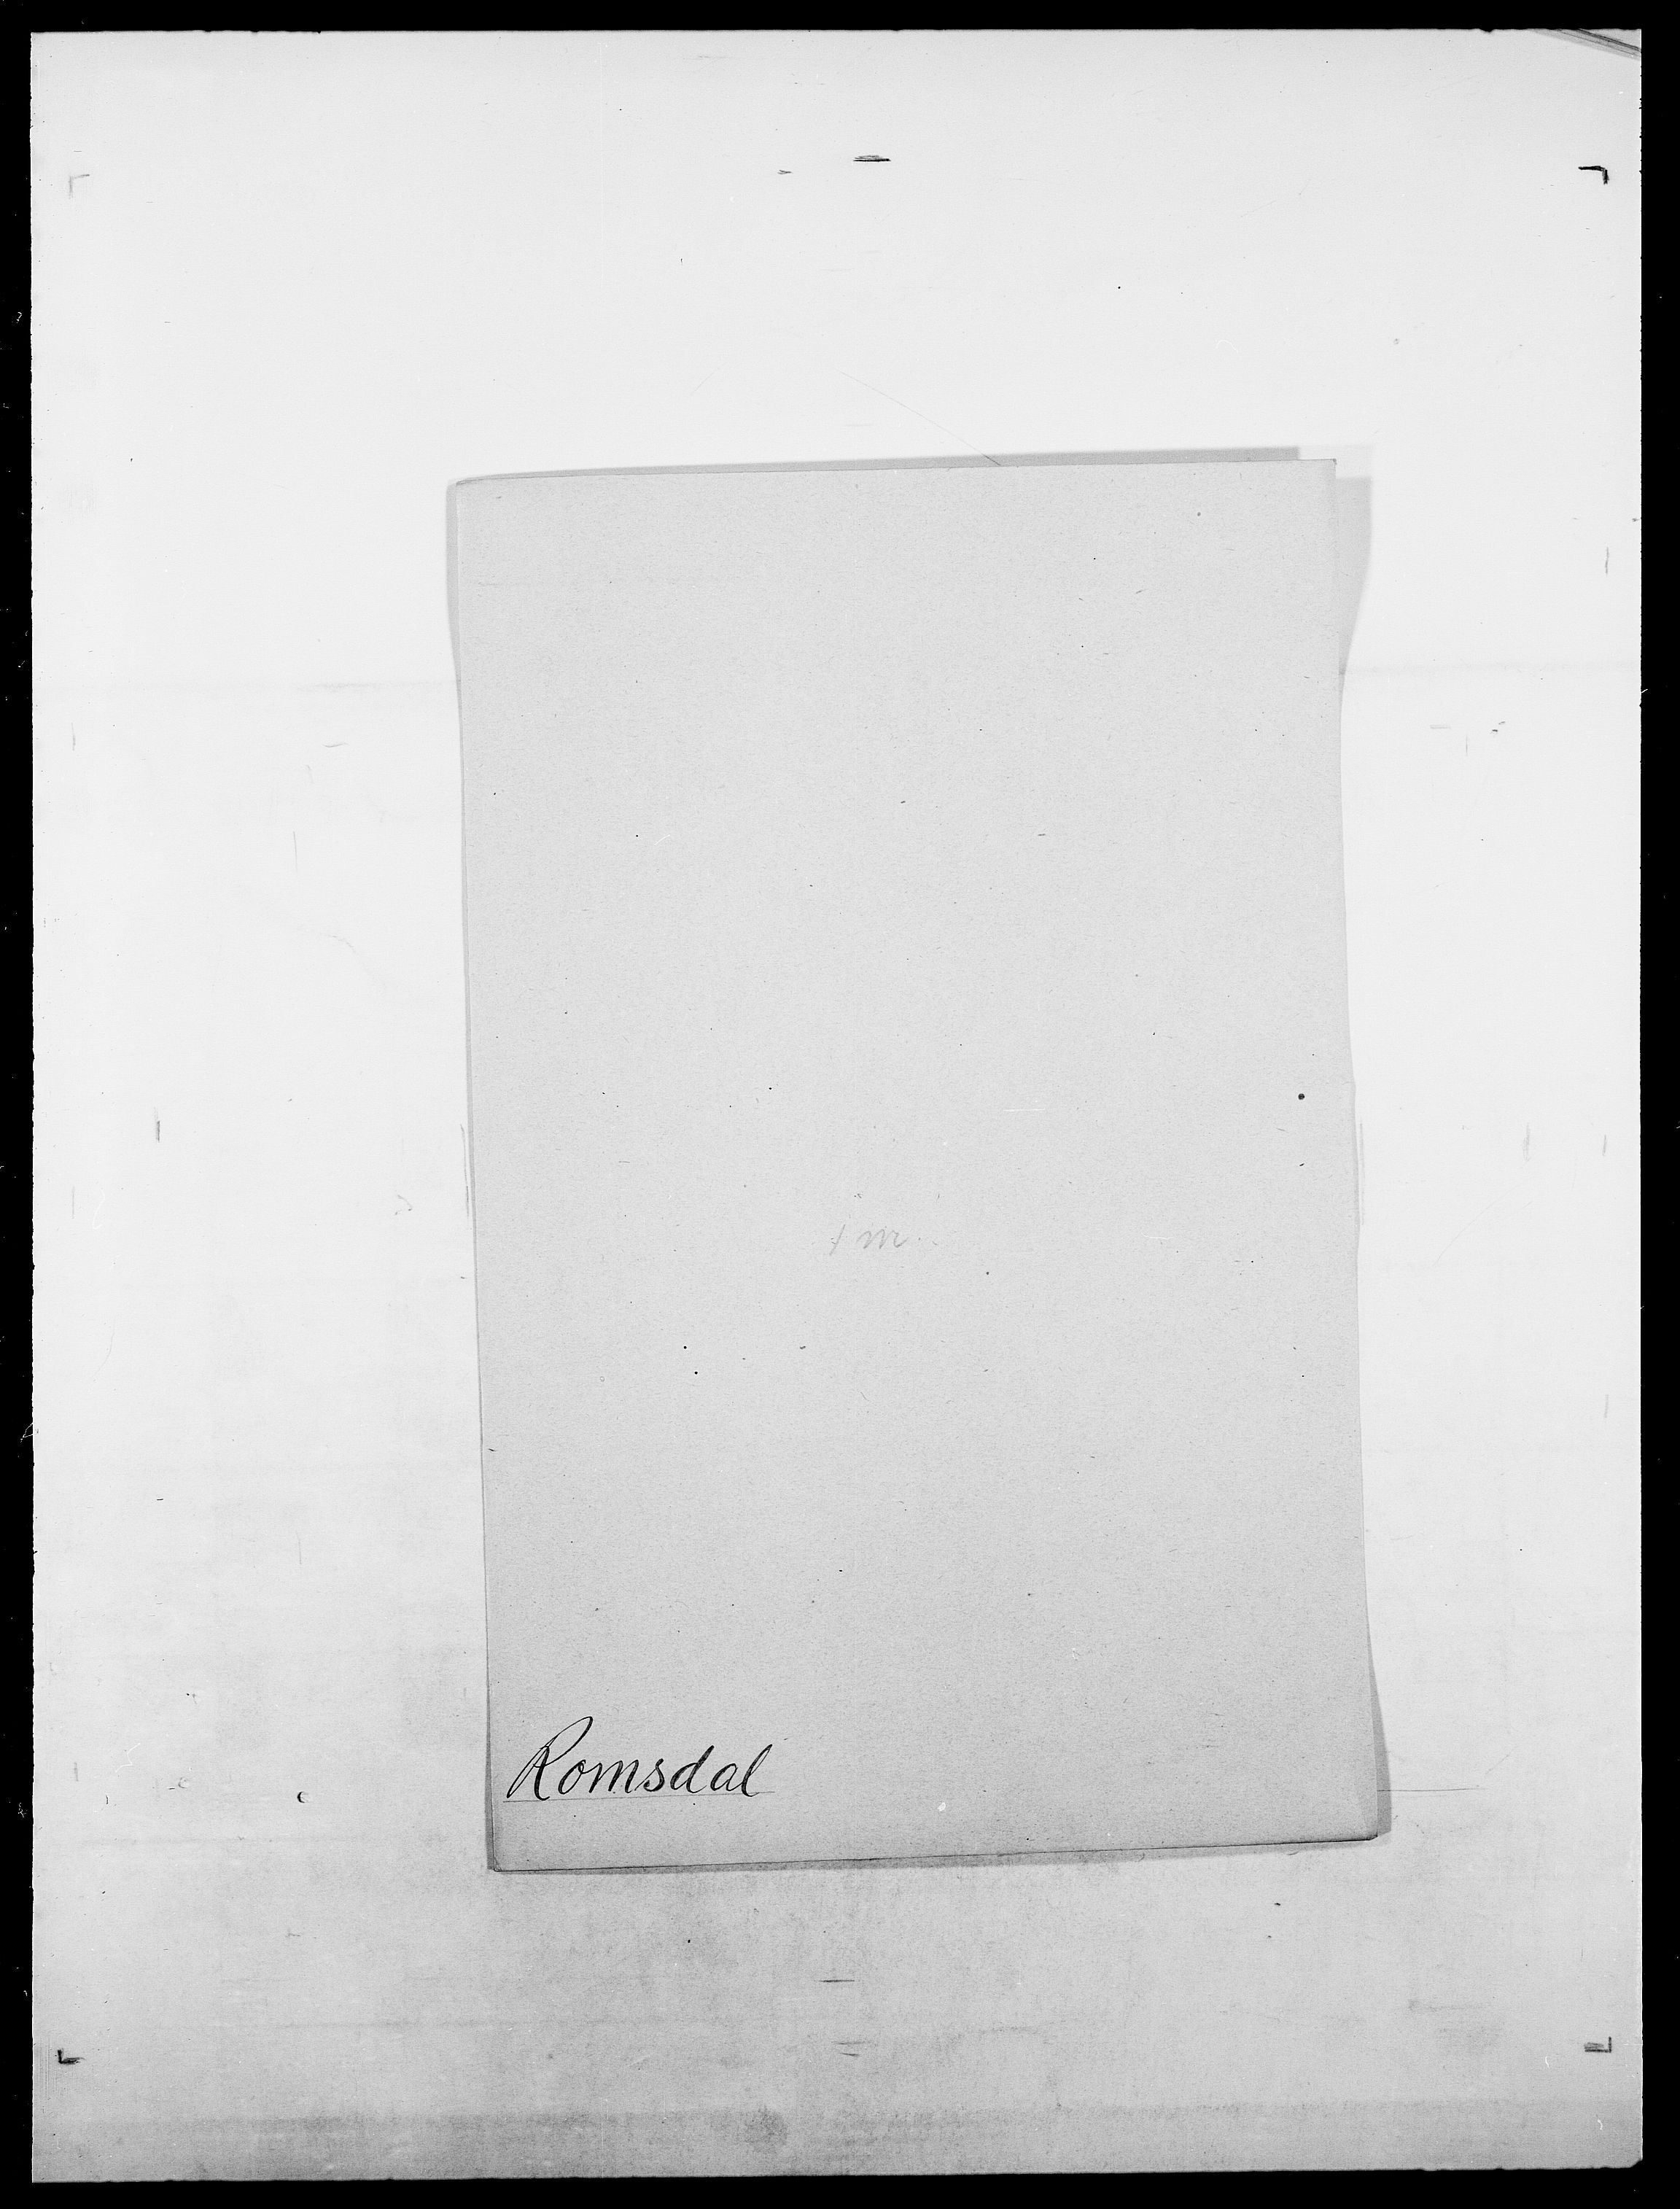 SAO, Delgobe, Charles Antoine - samling, D/Da/L0033: Roald - Røyem, s. 168